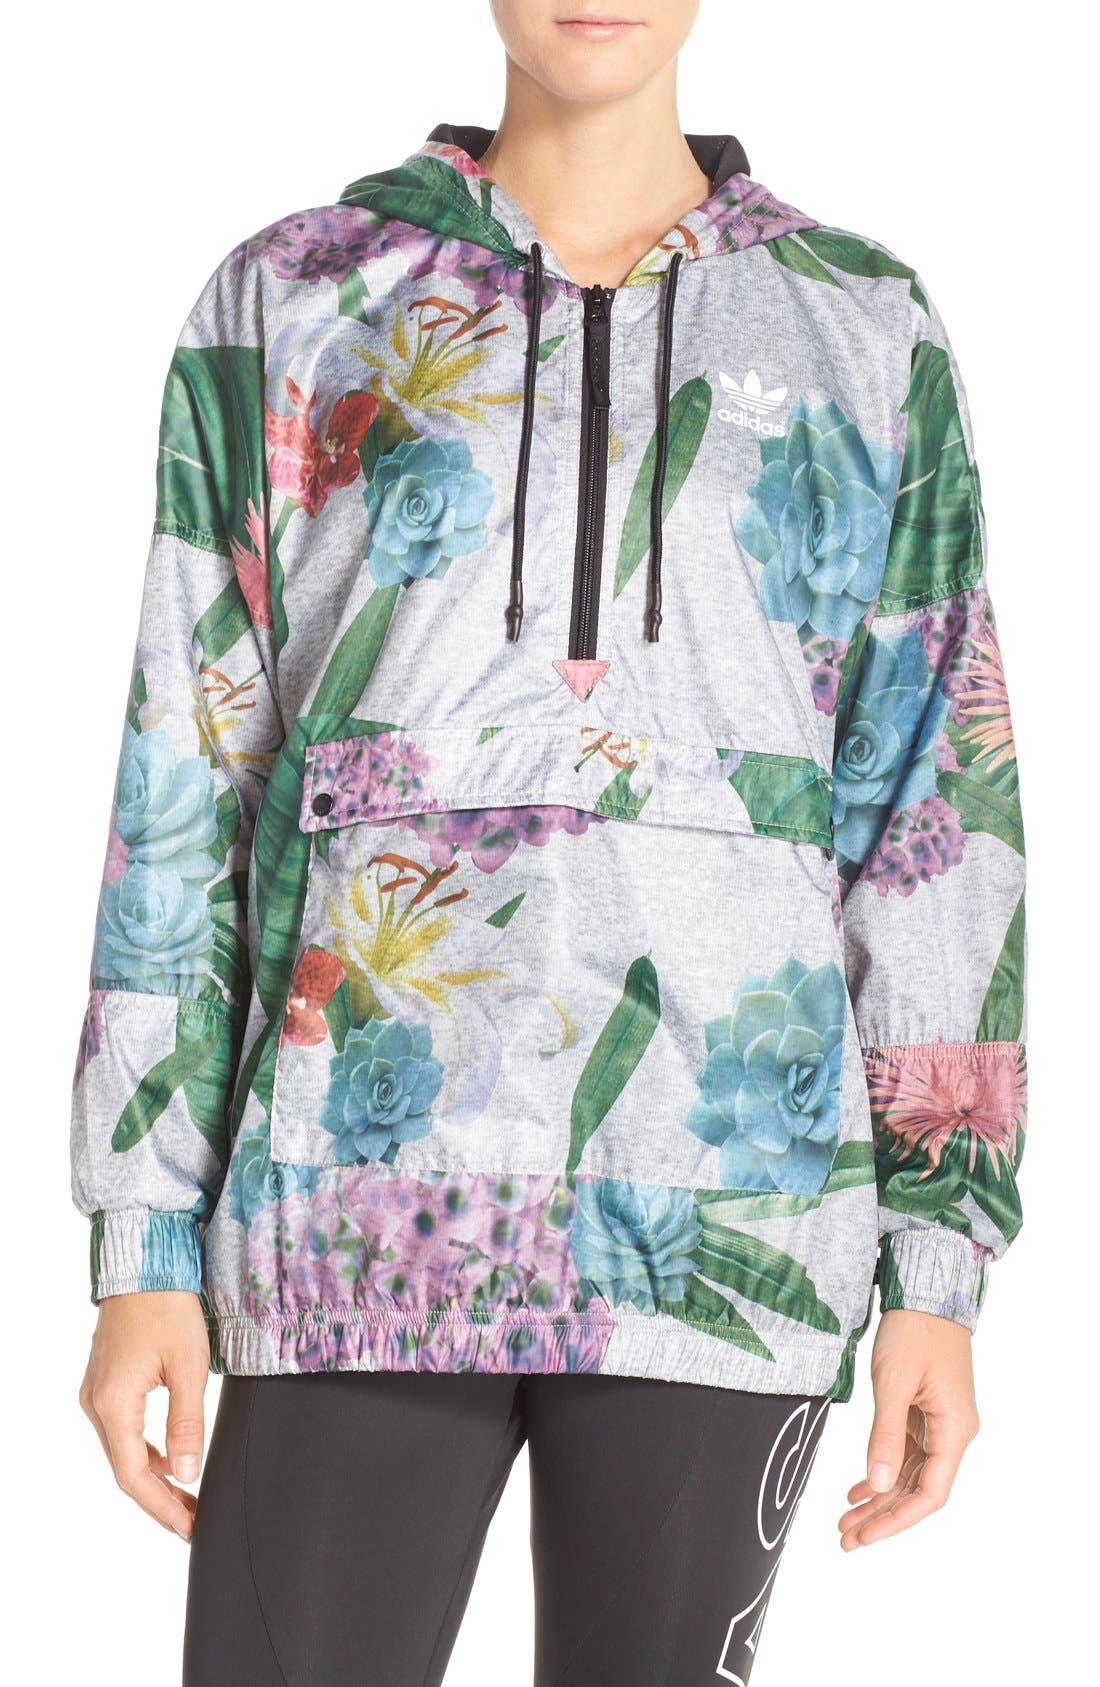 Main Image - adidas Originals 'Training' Floral Windbreaker Jacket